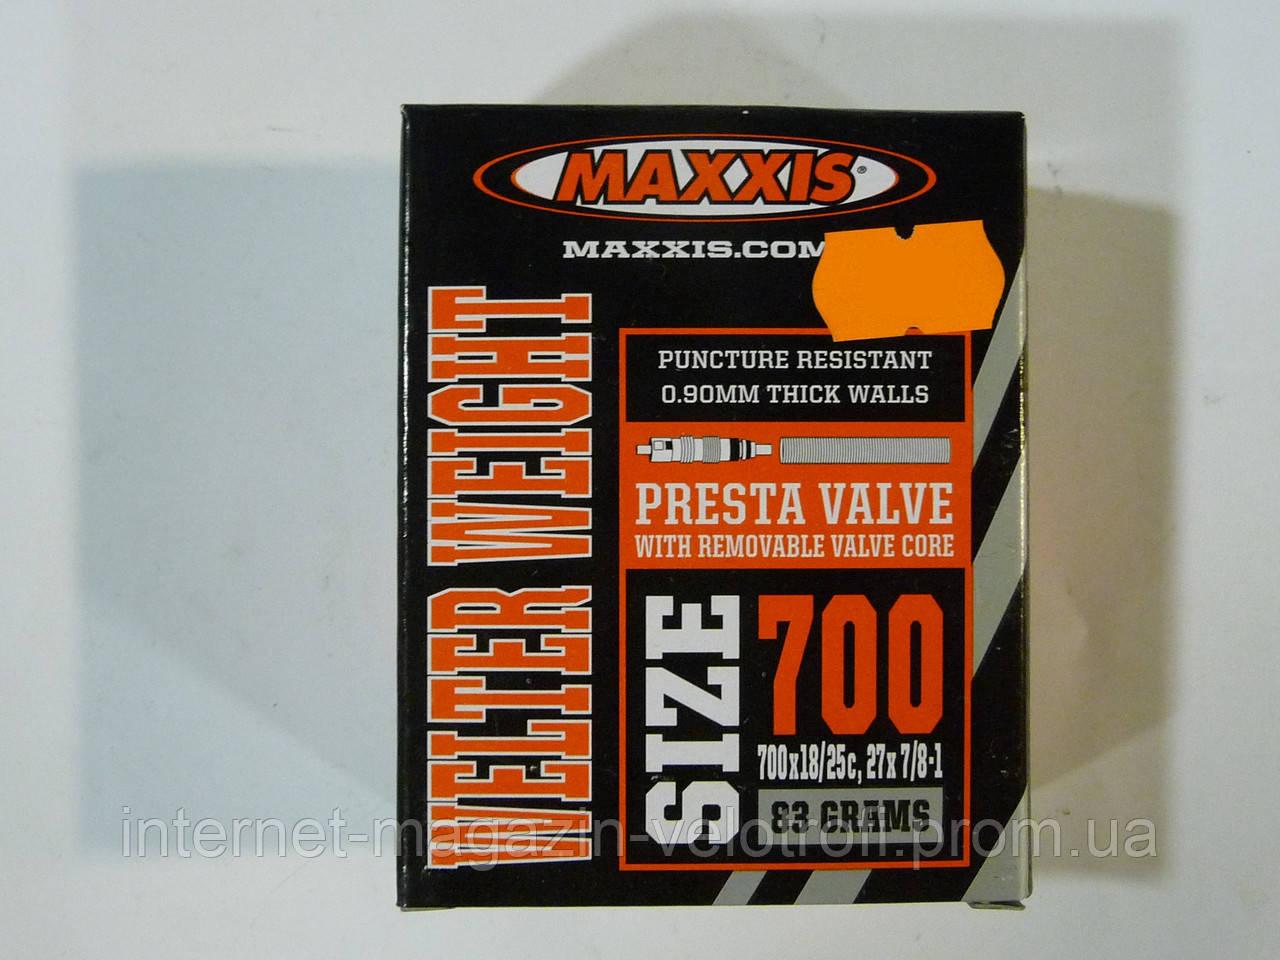 Велокамера Maxxis 700x18/25c F/V